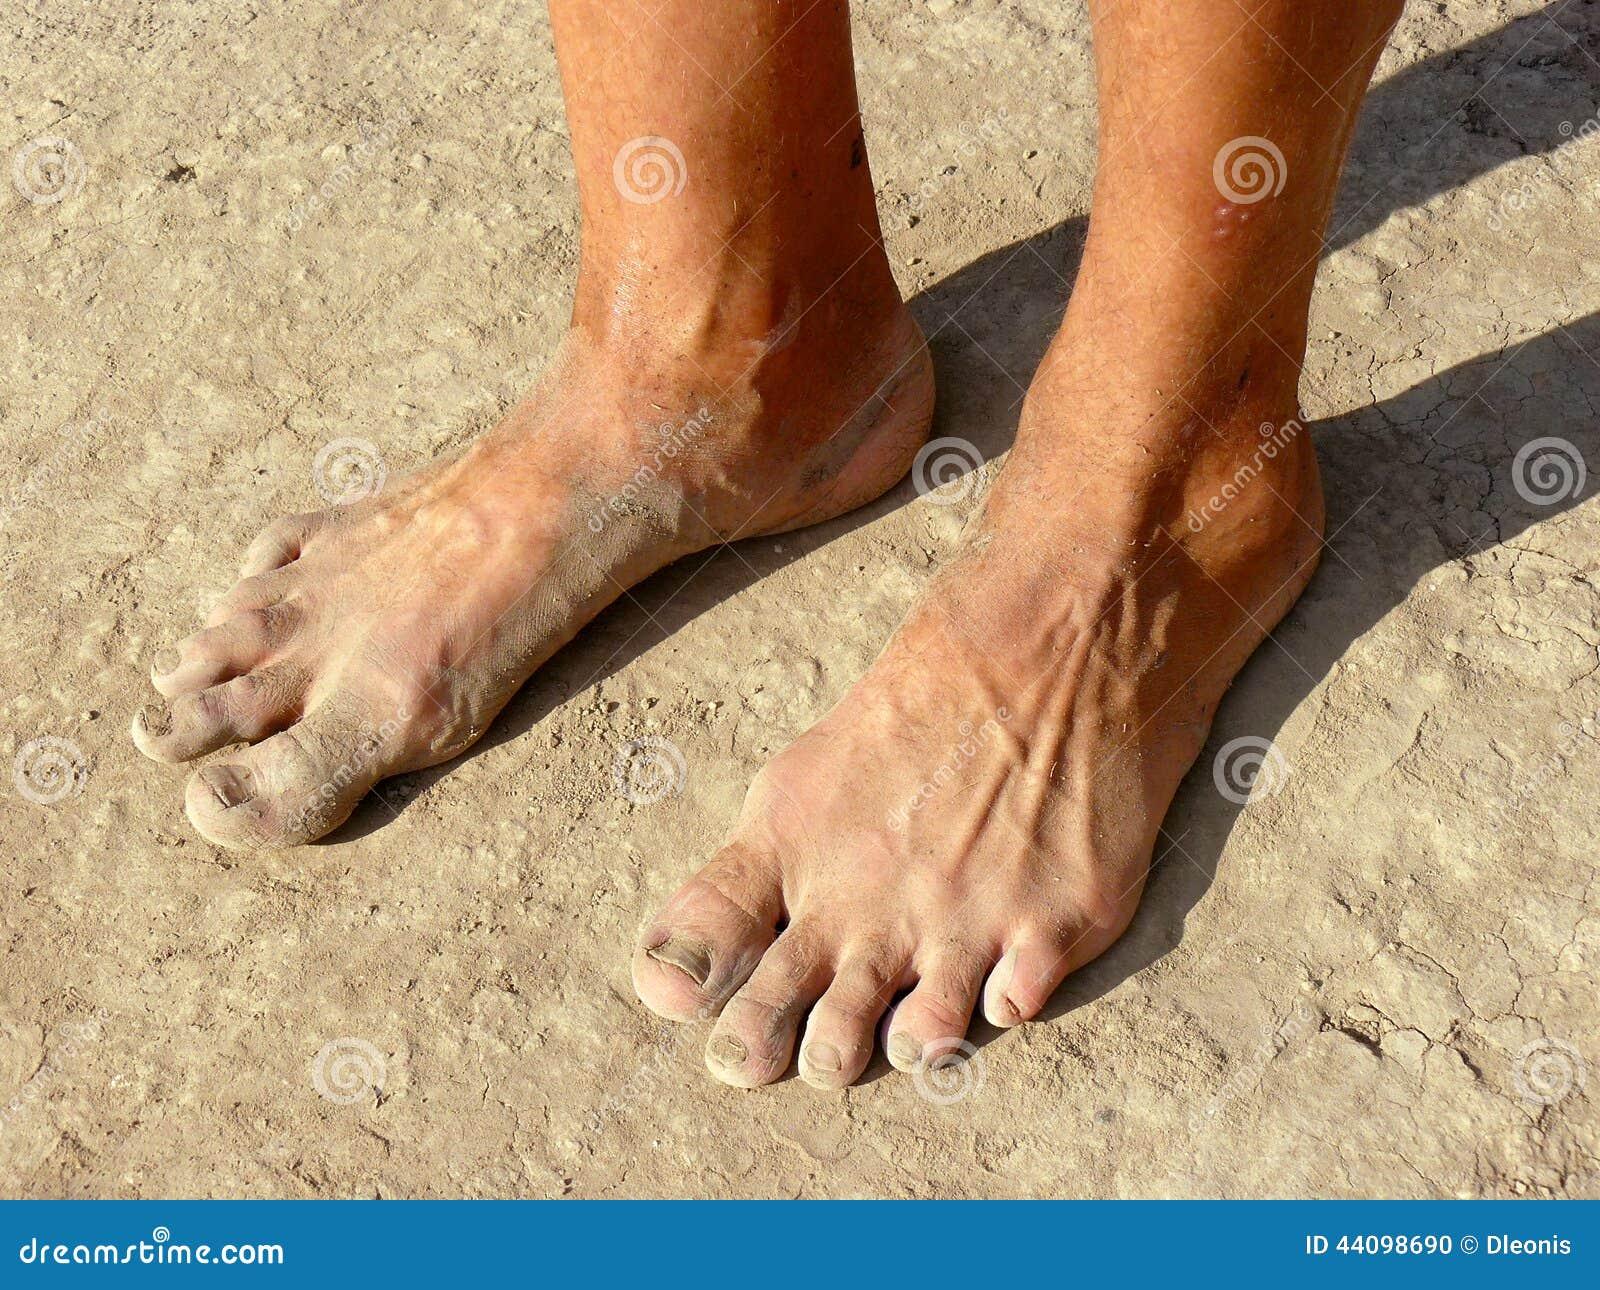 gay feet perverted